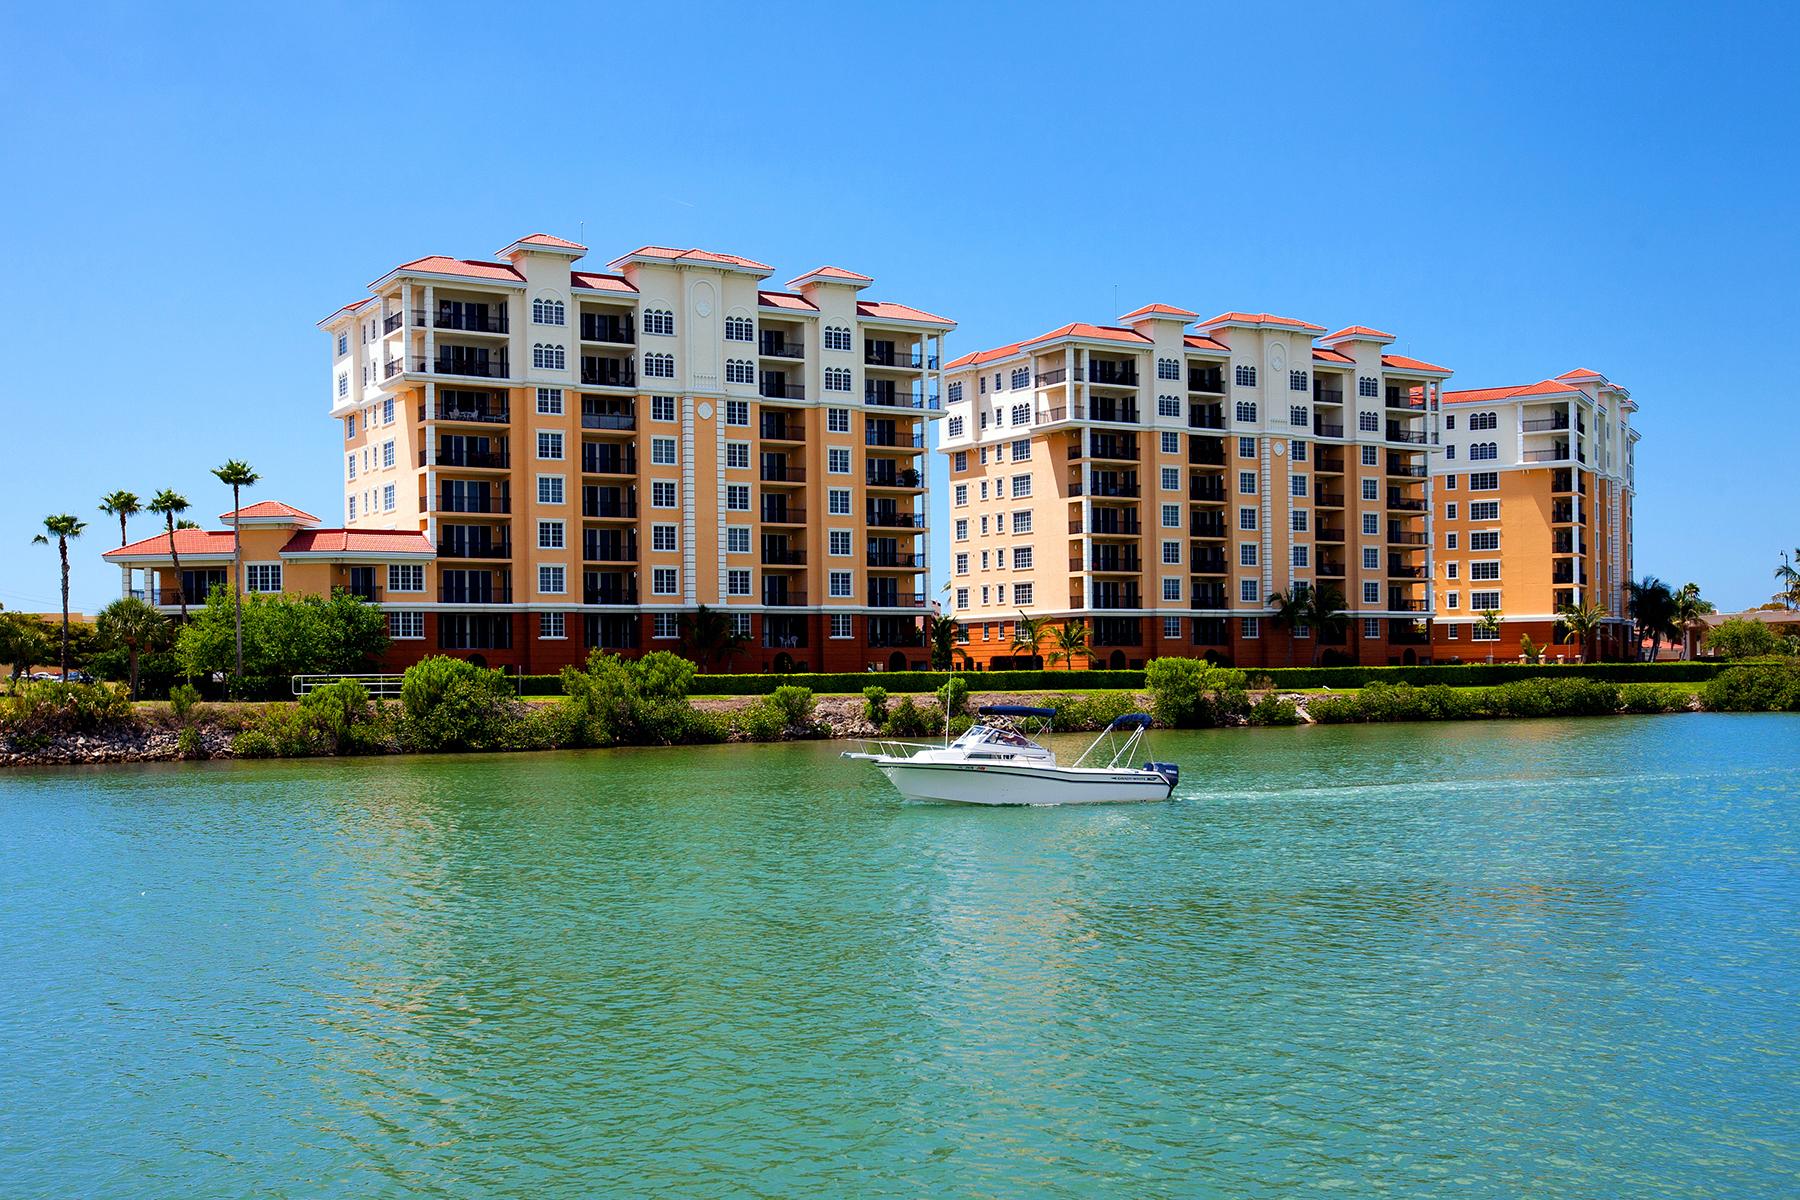 Condominium for Sale at WATERFRONT ON VENICE ISLAND 157 Tampa Ave E 906 Venice, Florida 34285 United States